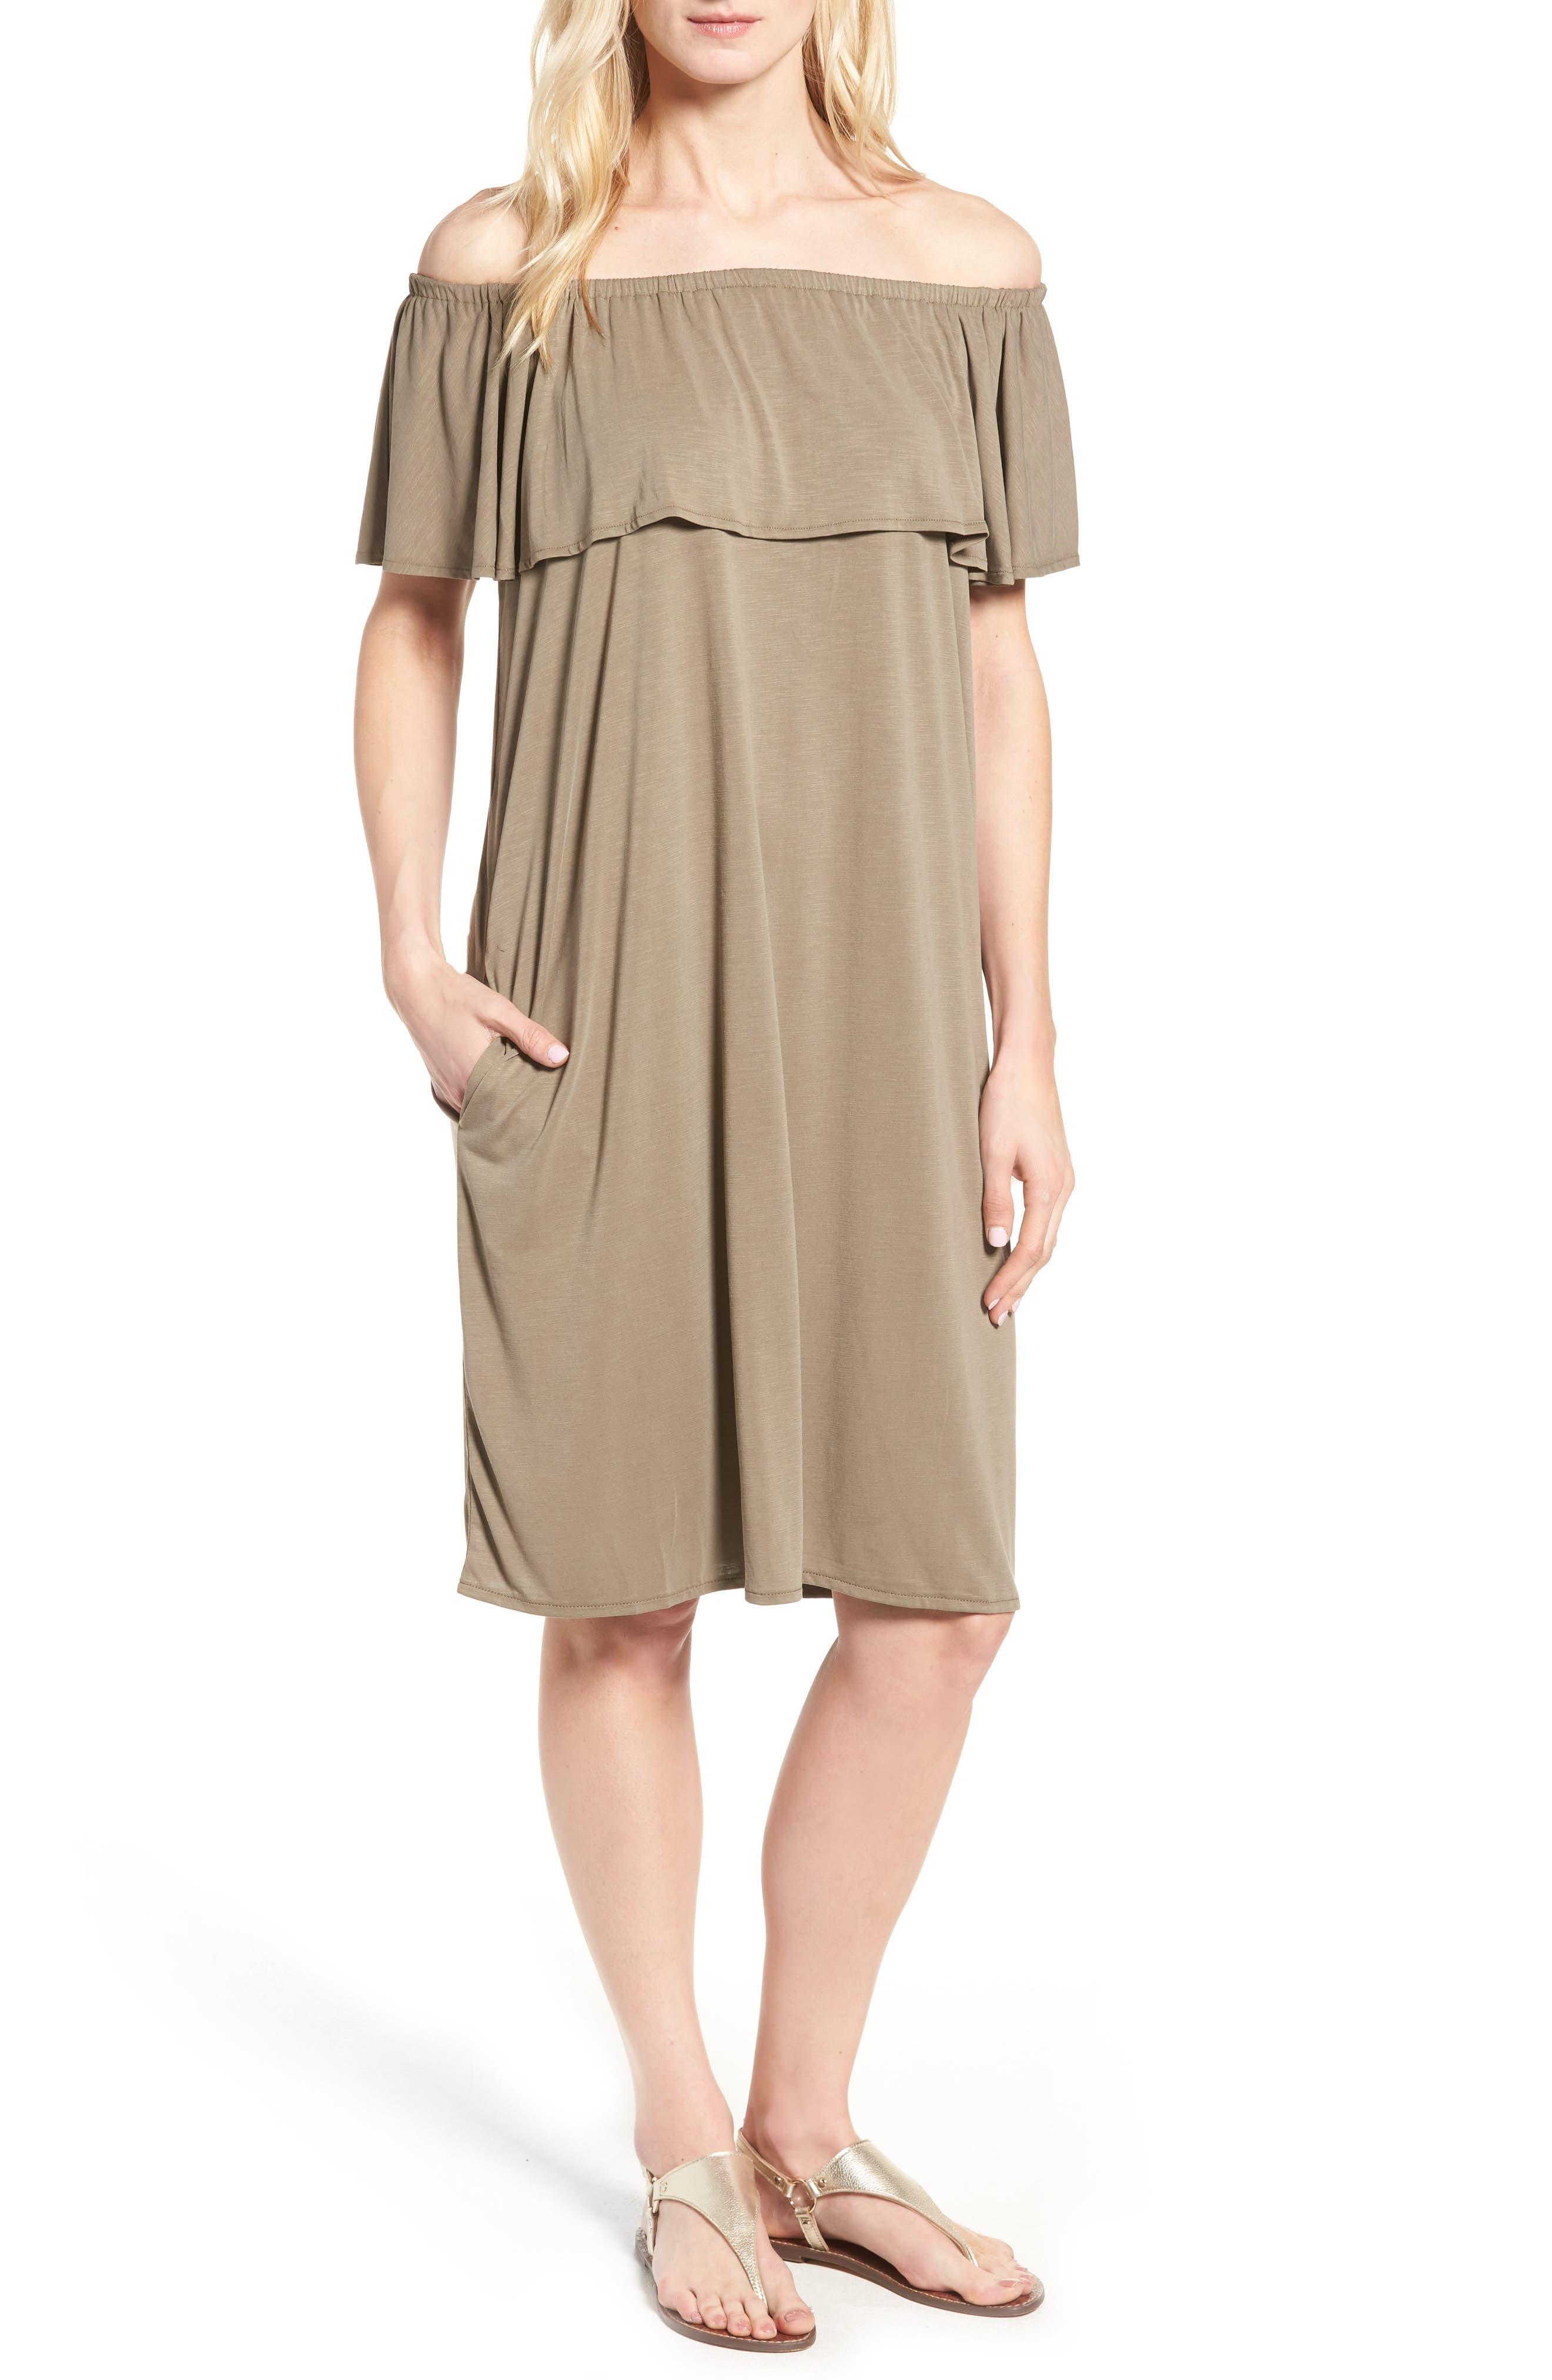 Boardwalk Convertible Jersey Dress,                         Main,                         color, Washed Marshland